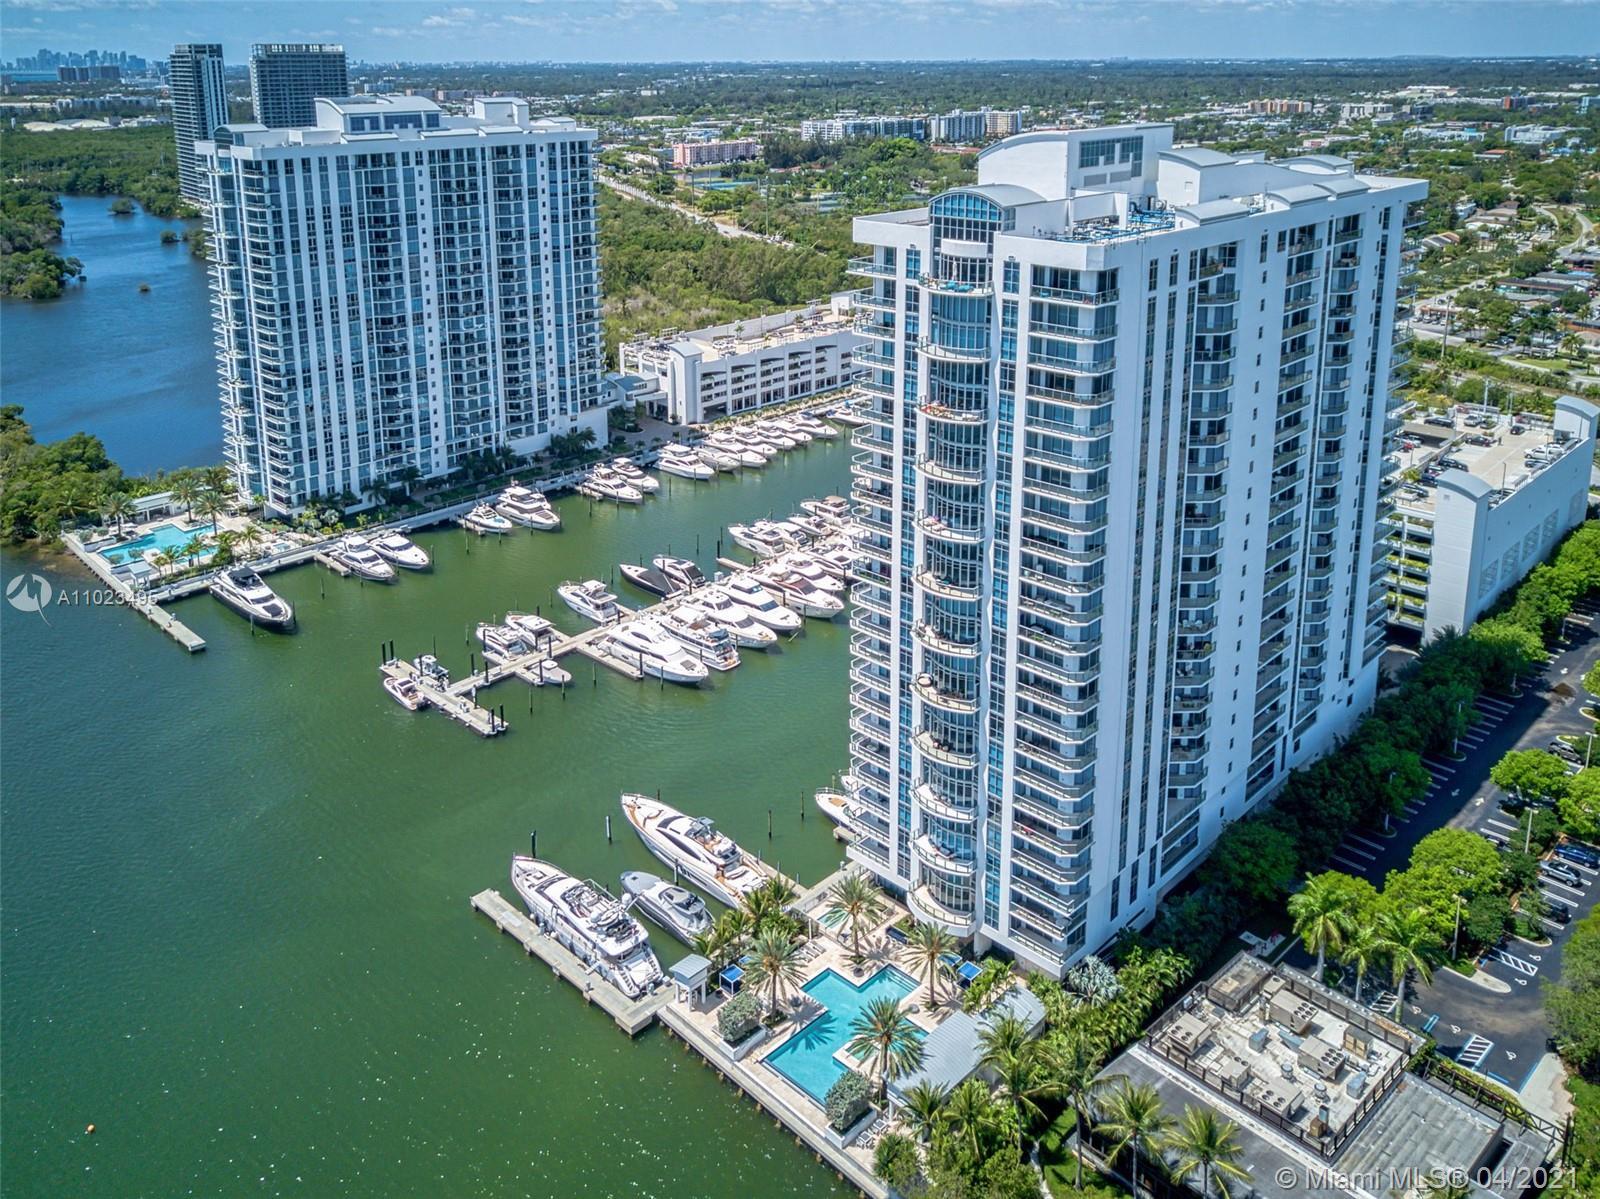 Marina Palms 2 #1209 - 17301 Biscayne Blvd #1209, North Miami Beach, FL 33160